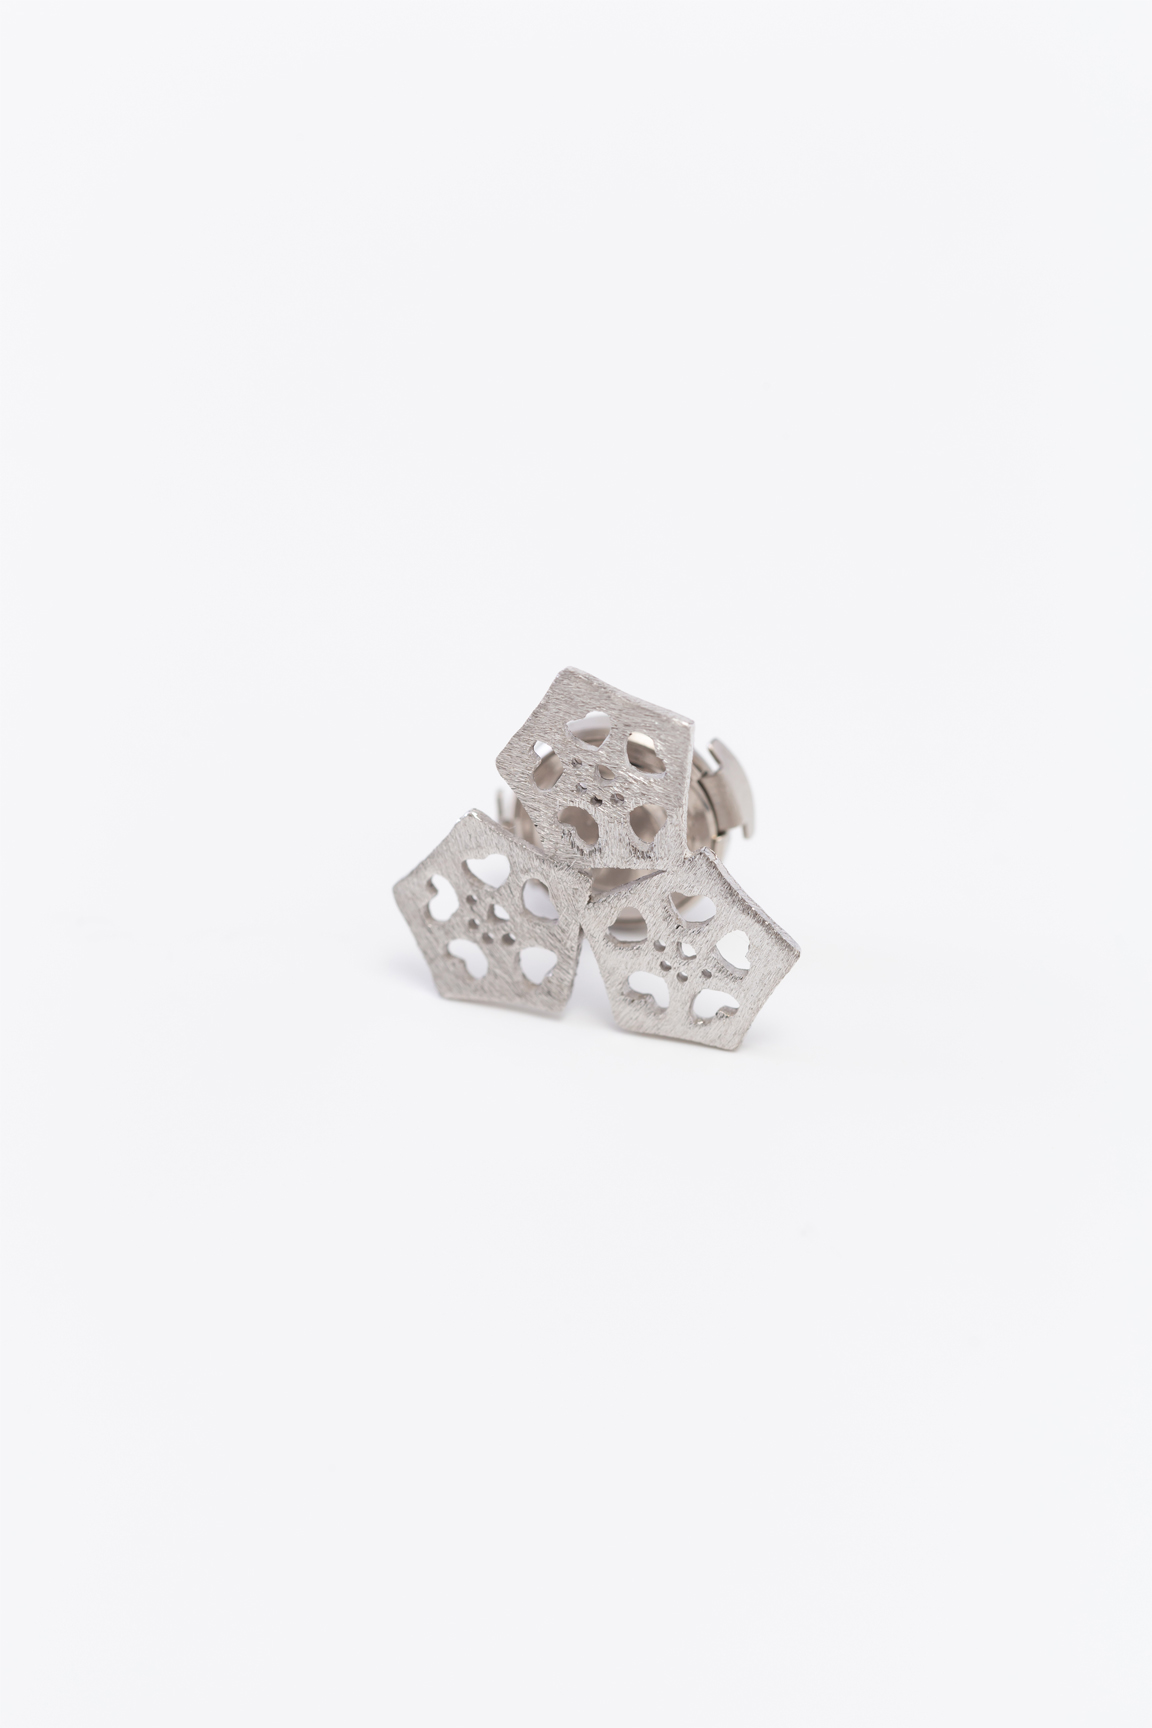 Okra_pad pin broach(silver) (3Okra)